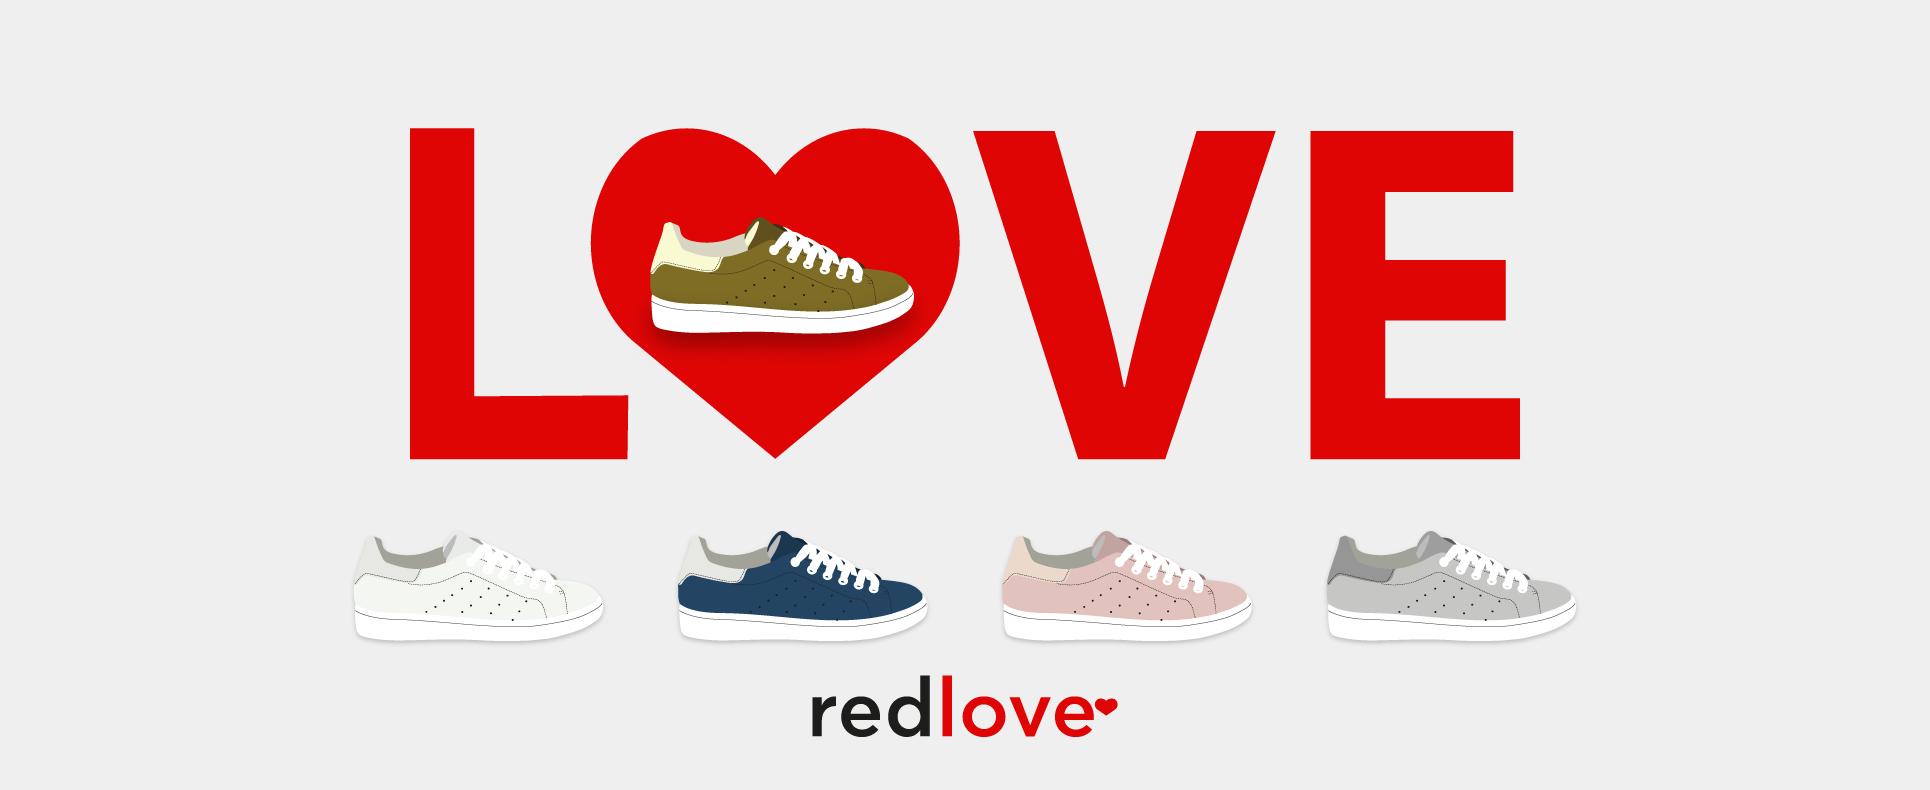 Love redlove